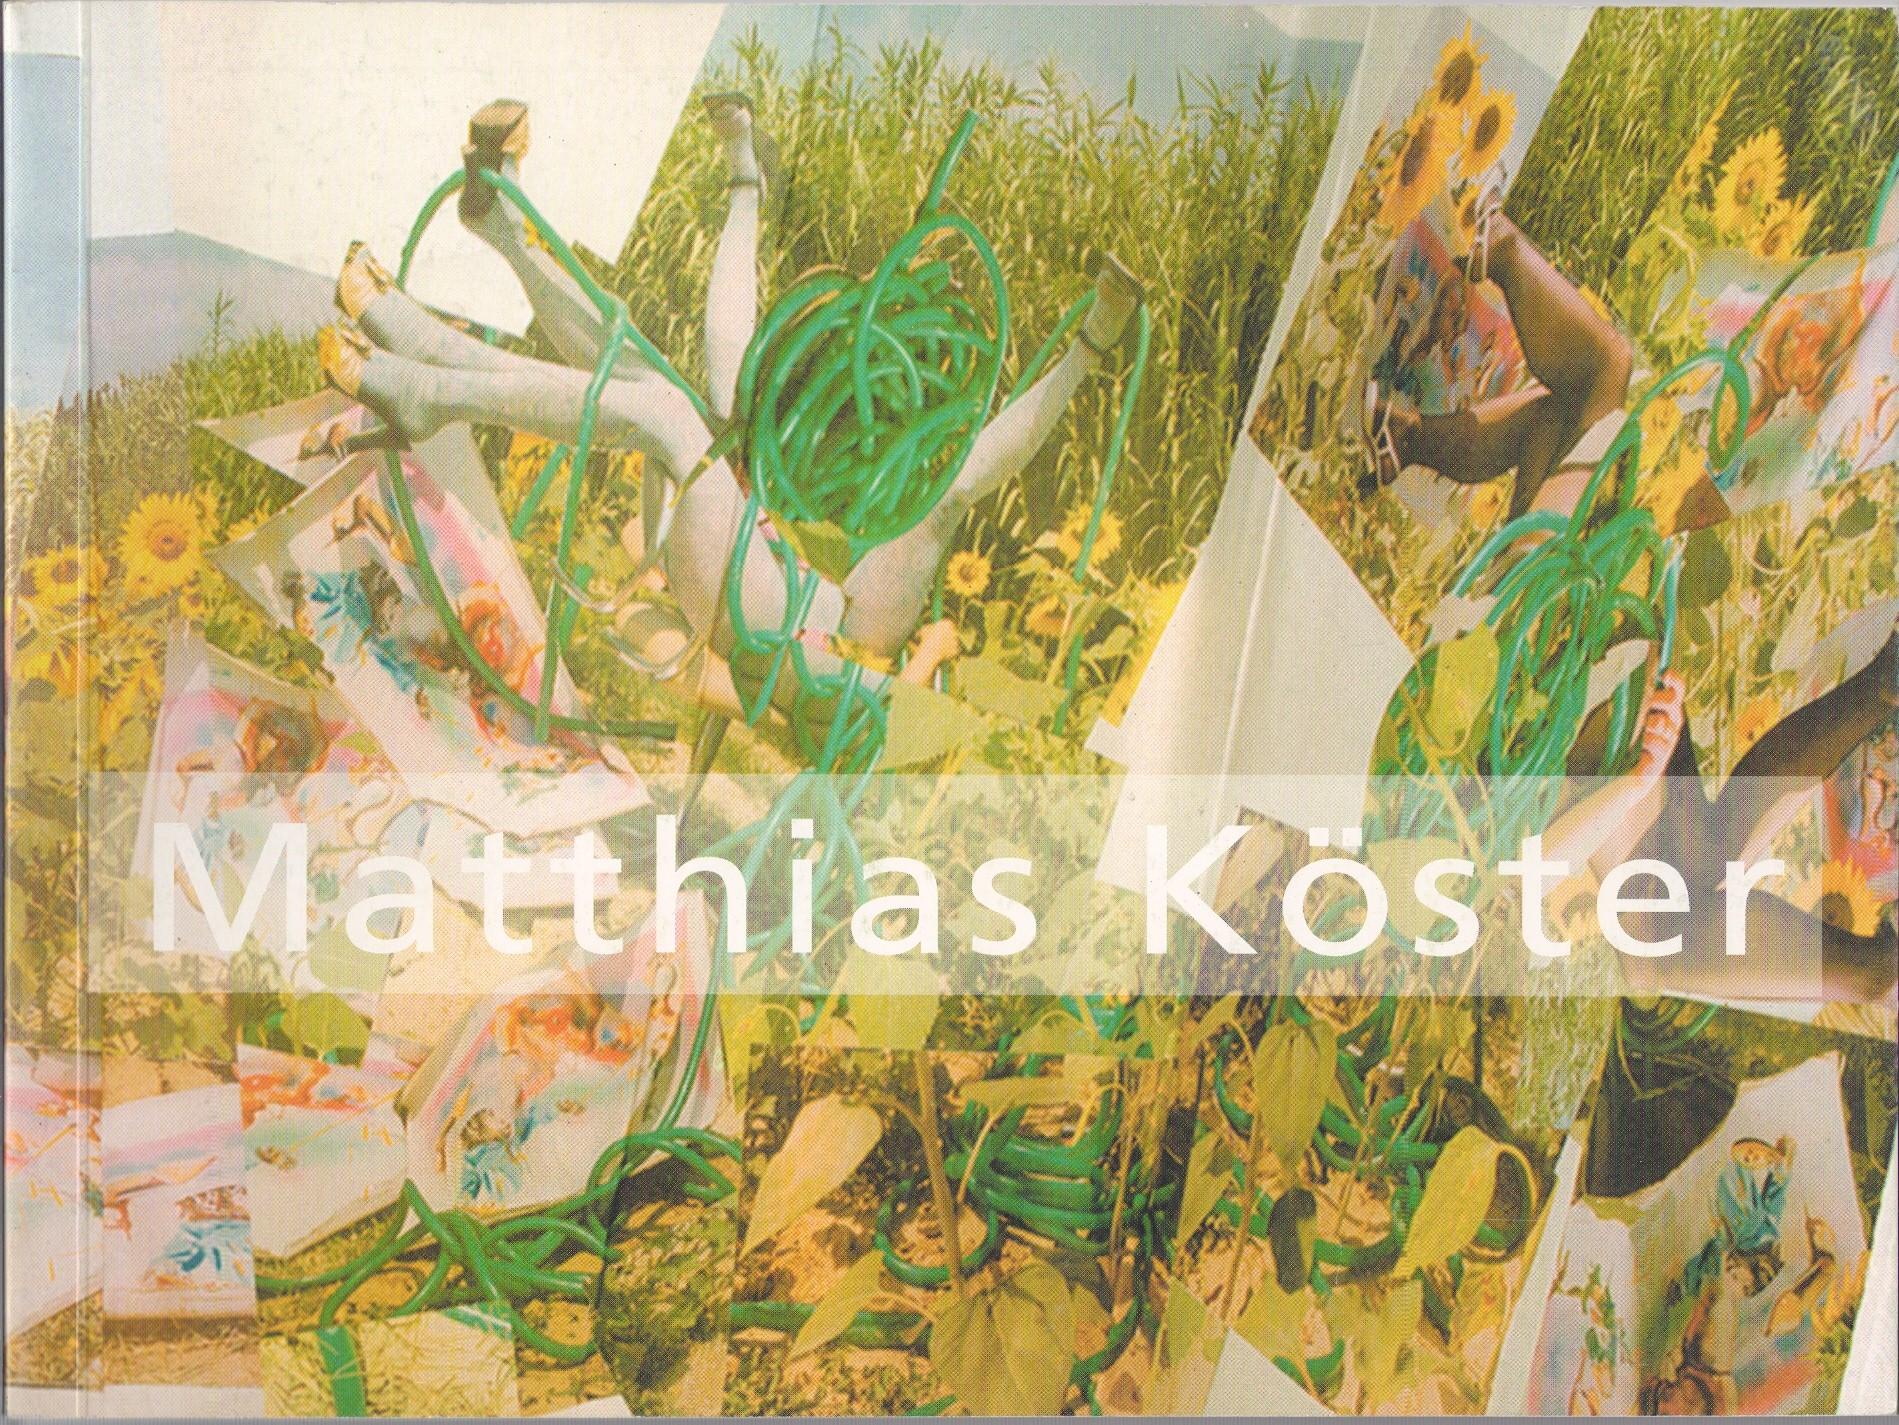 Matthias Köster, 1999